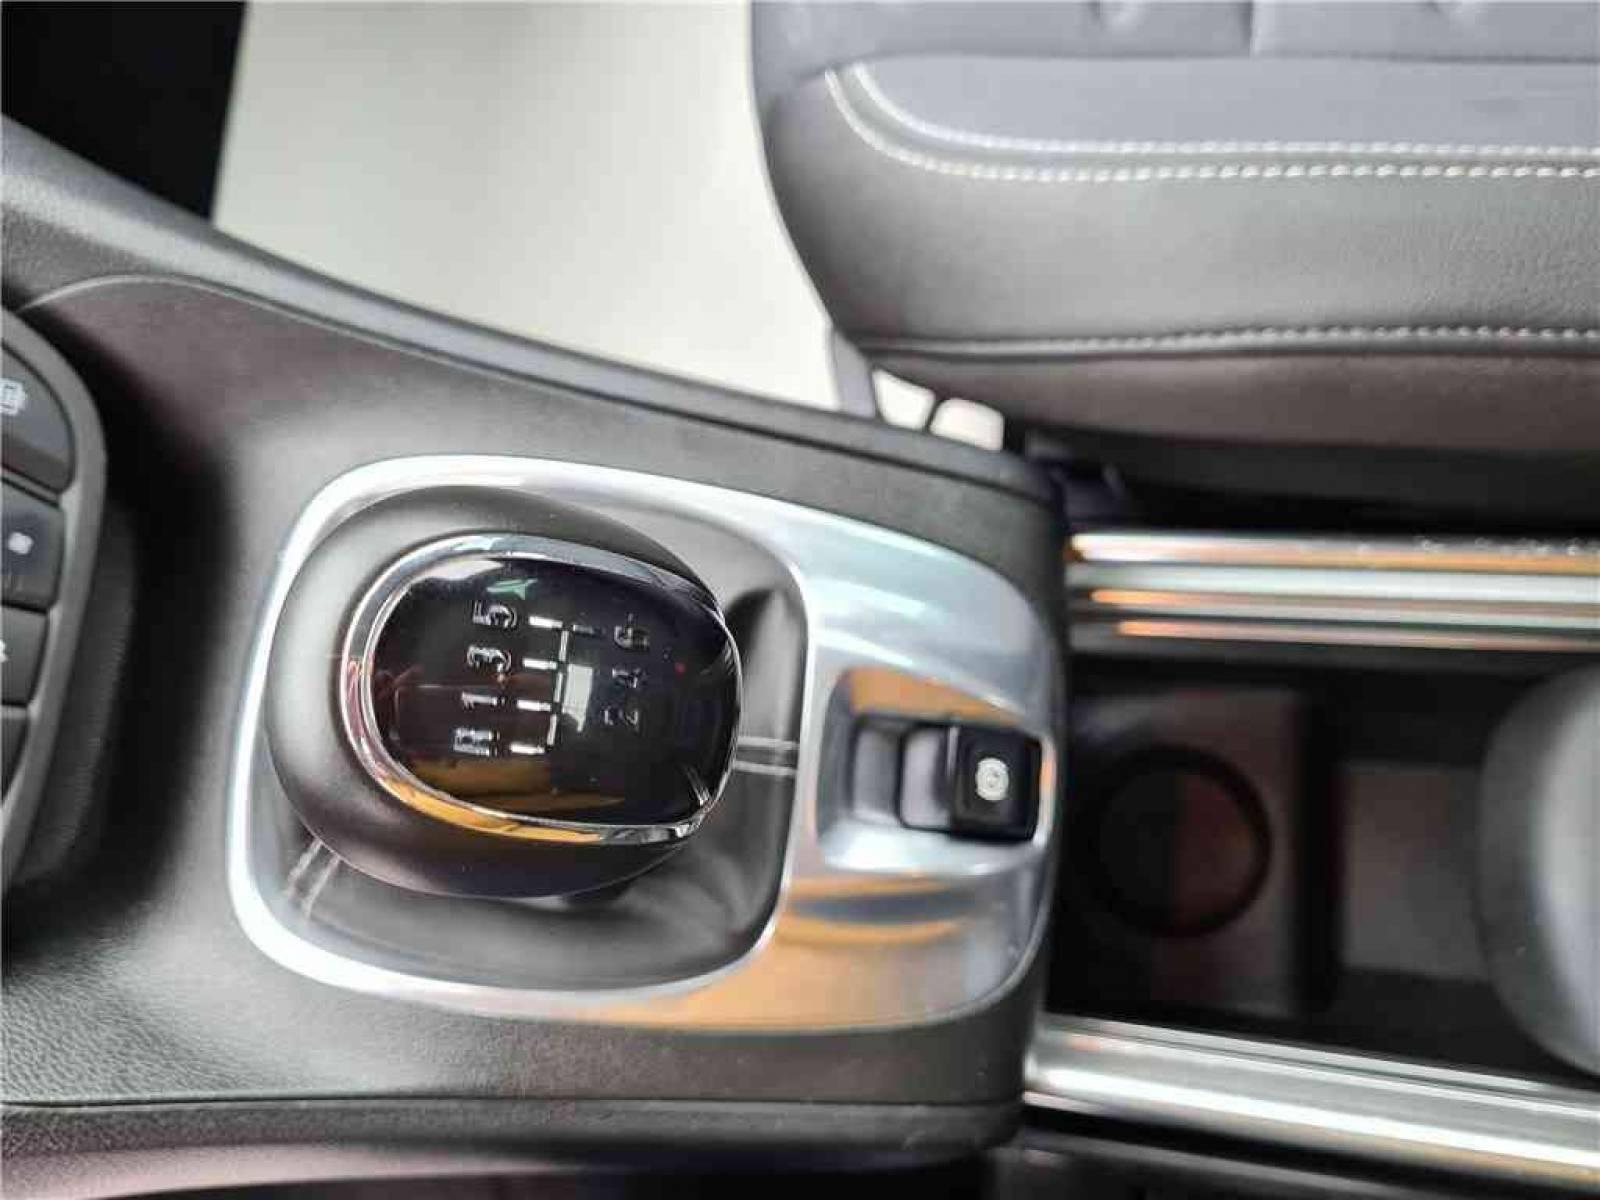 OPEL Meriva 1.6 CDTI - 110 ch Start/Stop - véhicule d'occasion - Groupe Guillet - Opel Magicauto - Chalon-sur-Saône - 71380 - Saint-Marcel - 42